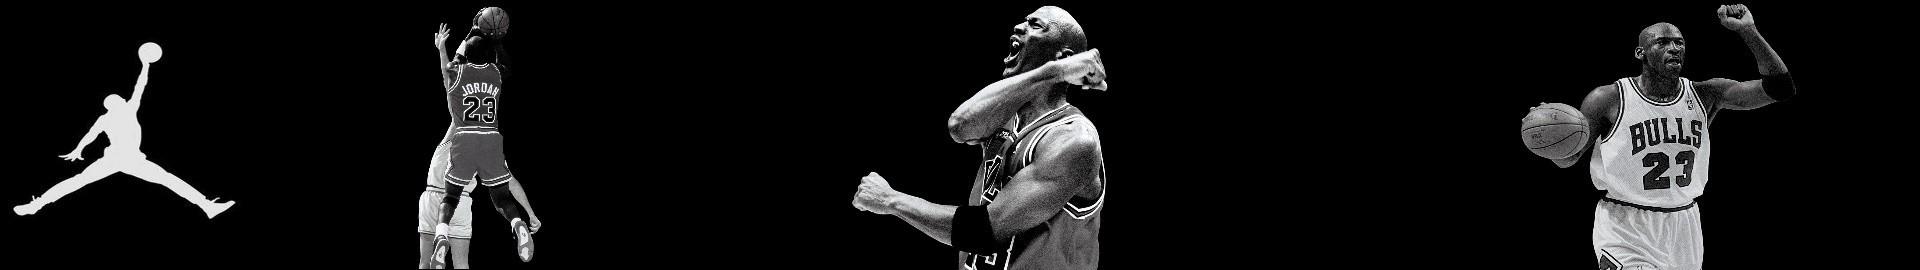 Abbigliamento Jordan Jumpman Uomo | Basket Zone Siena